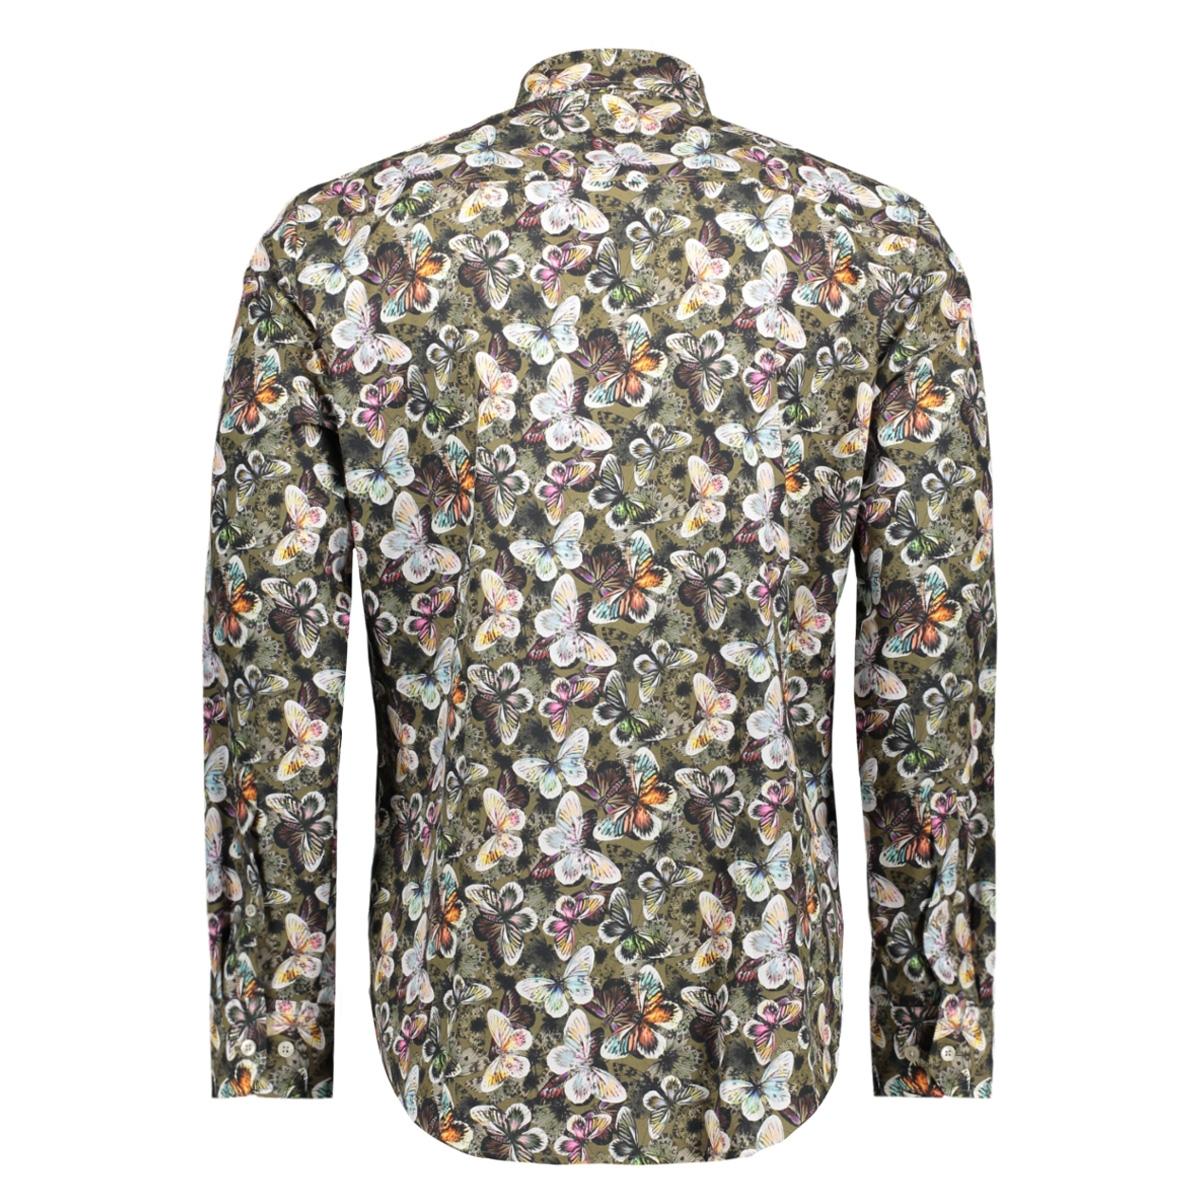 0301 8119 haupt overhemd 01